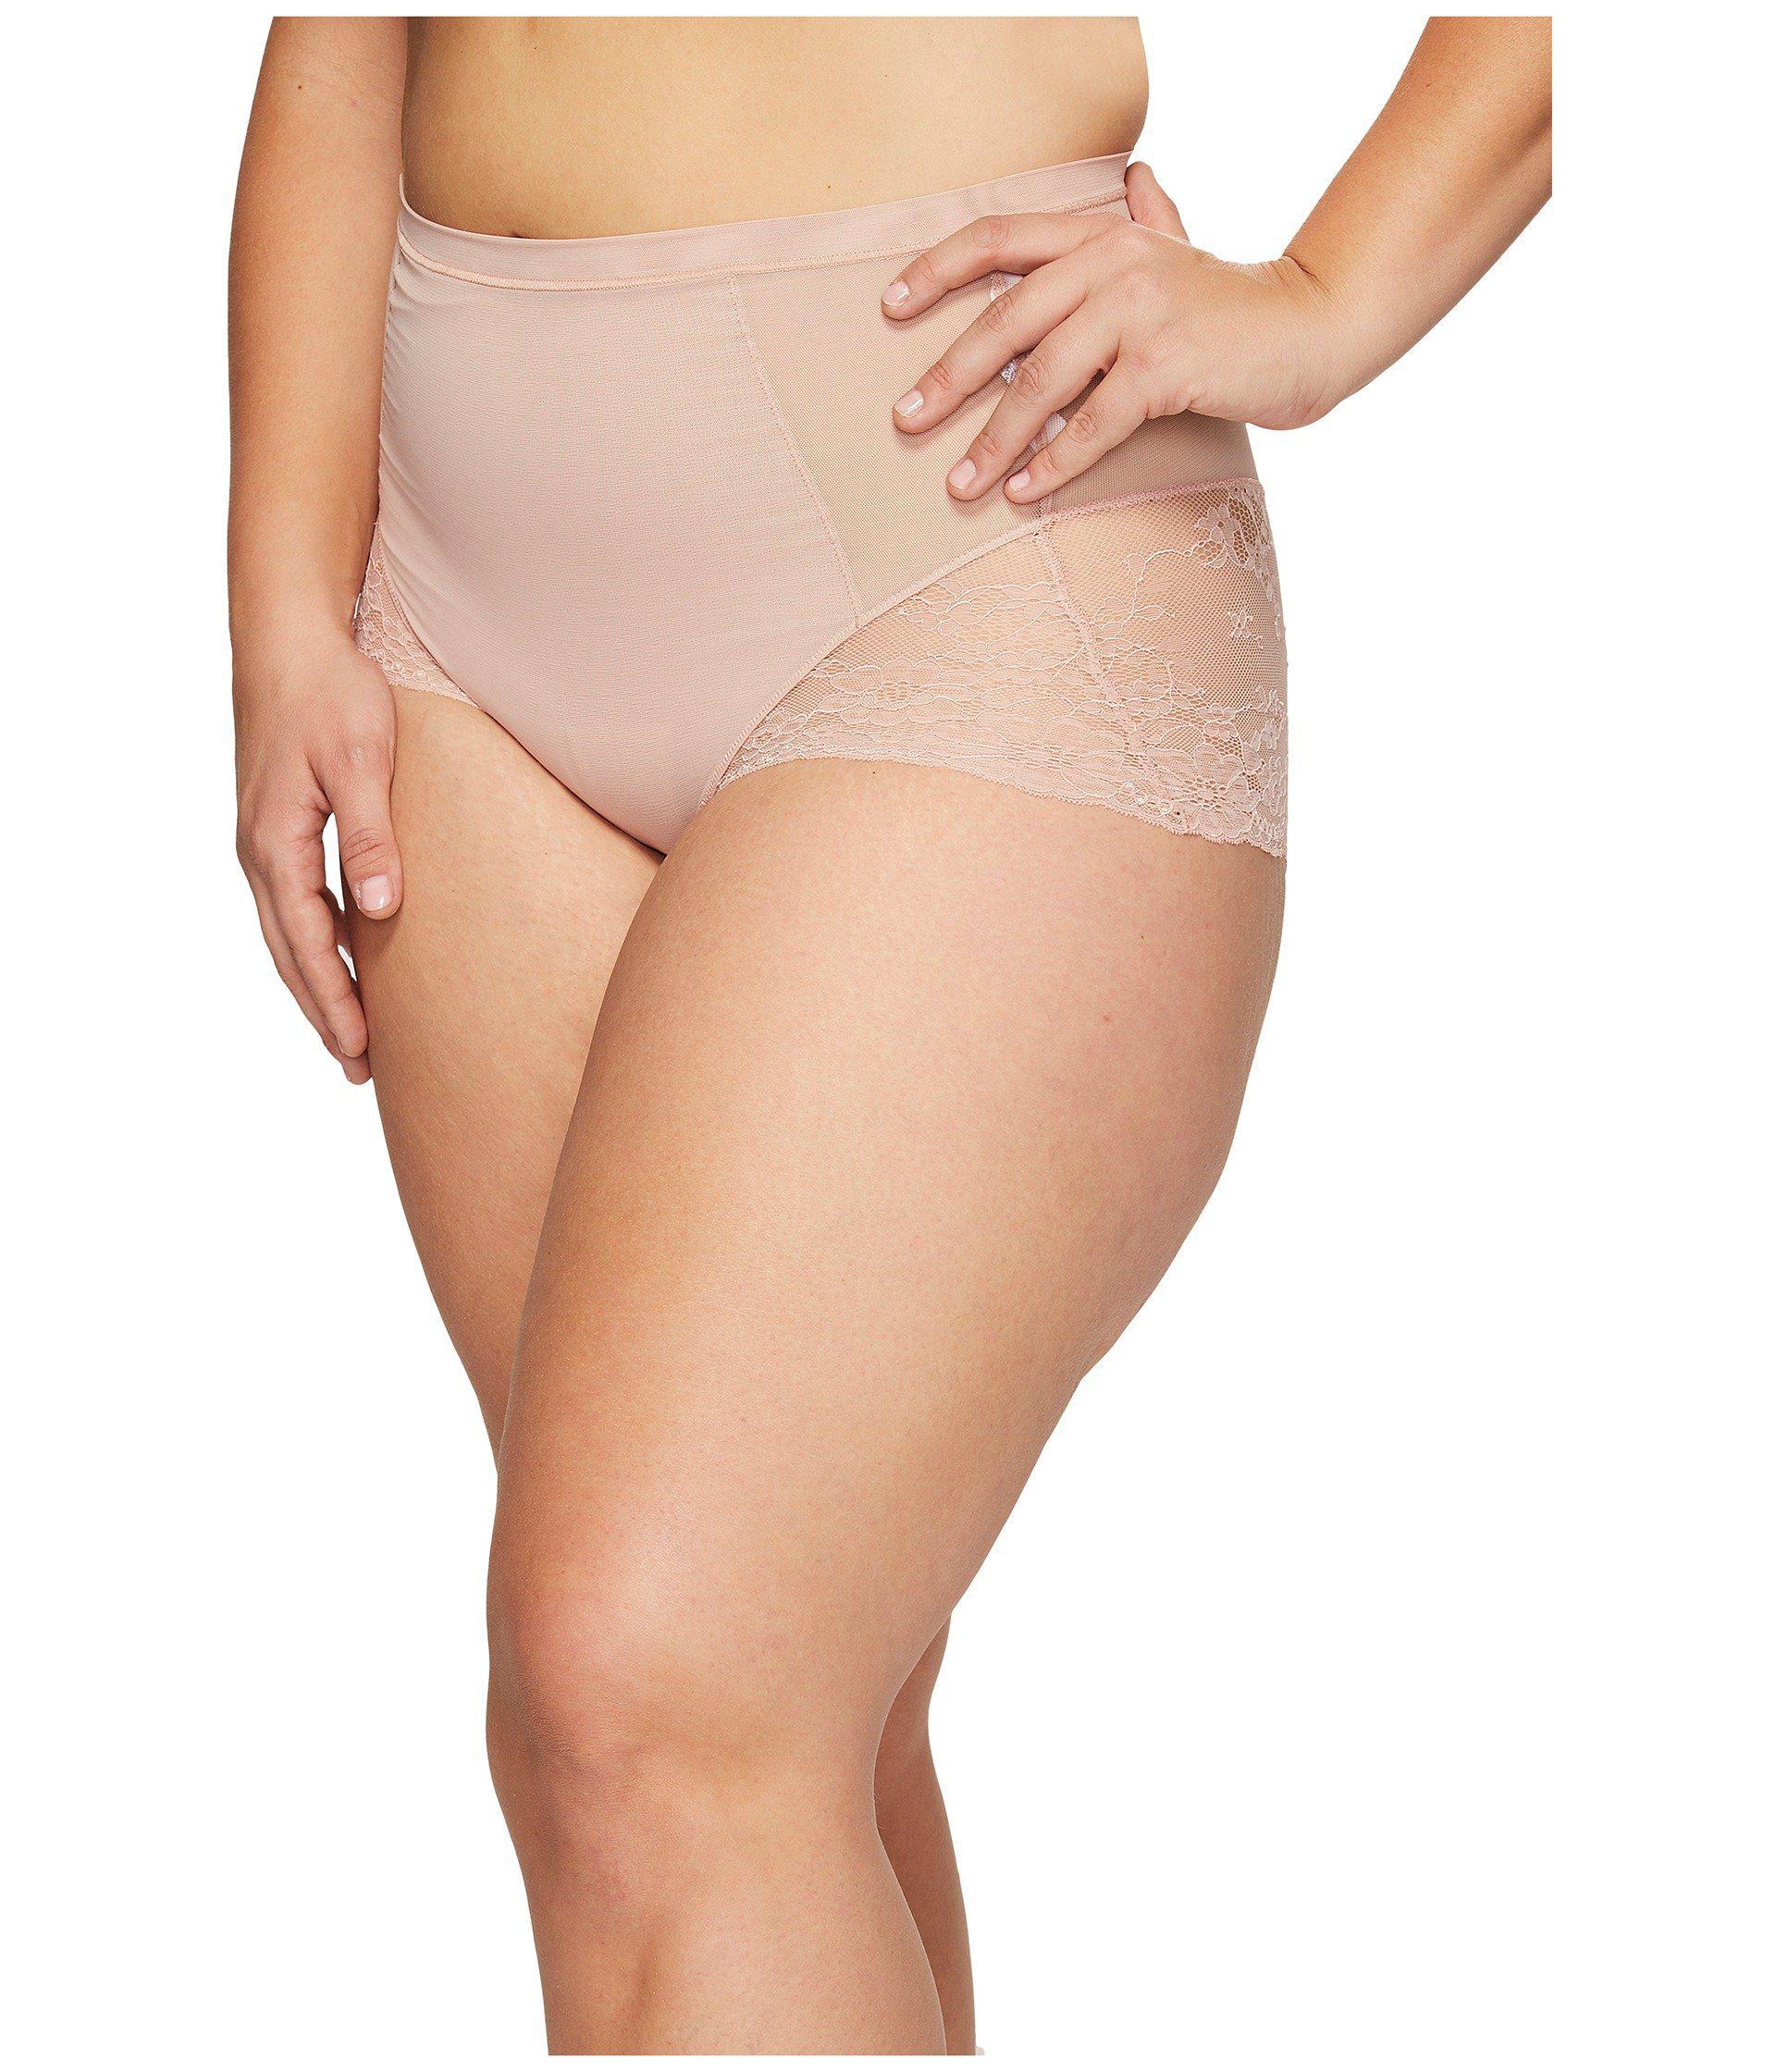 1974f0c9c4a Lyst - Spanx Plus Size Spotlight On Lace Brief (vintage Rose) Women s  Underwear